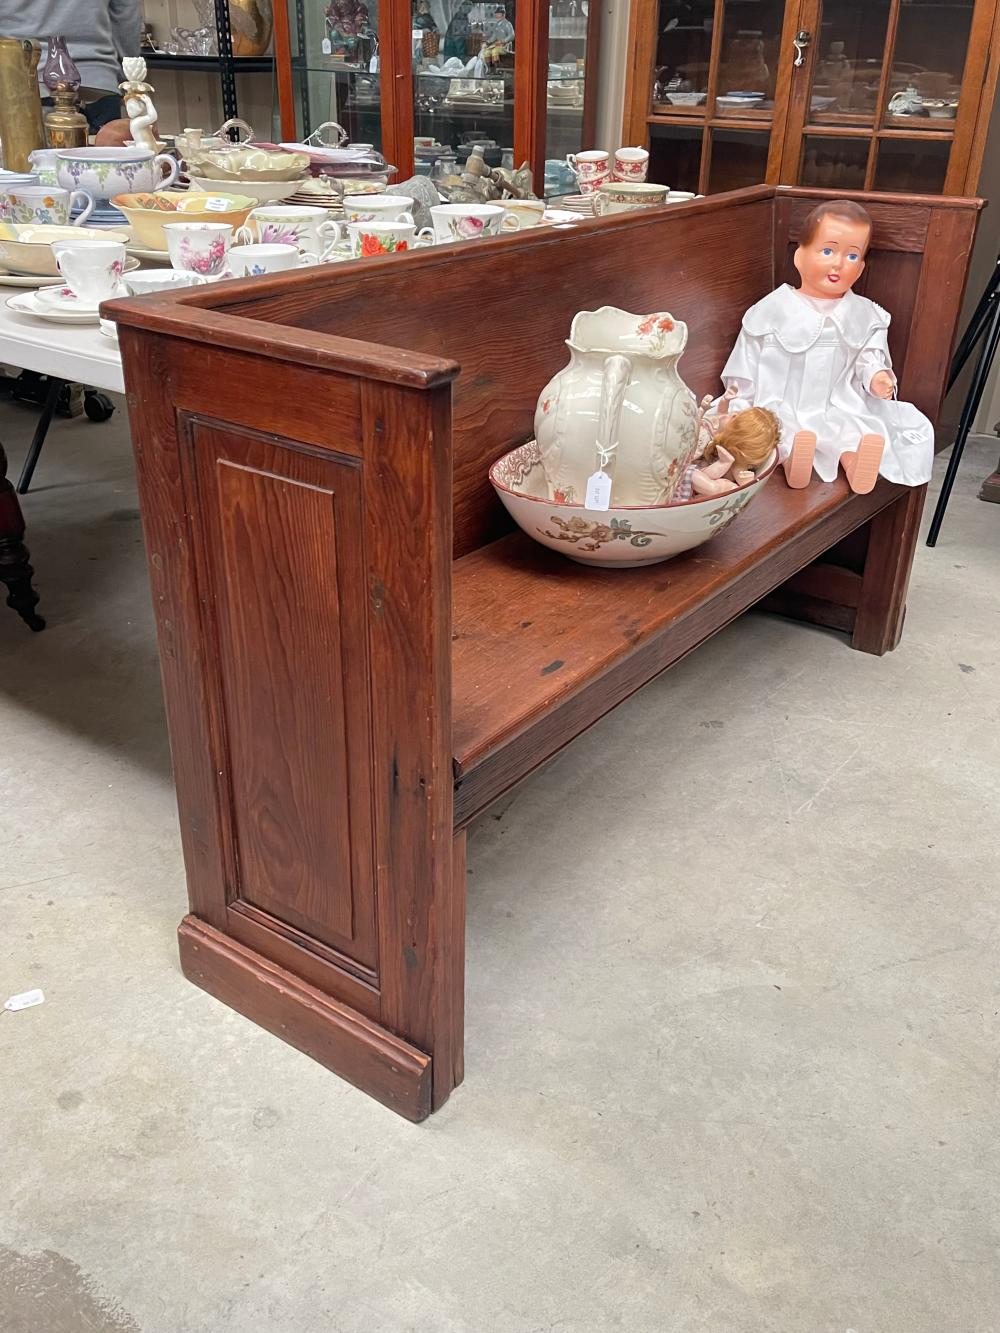 Antique American Pennsylvanian bench, approx 83cm H x 151cm W